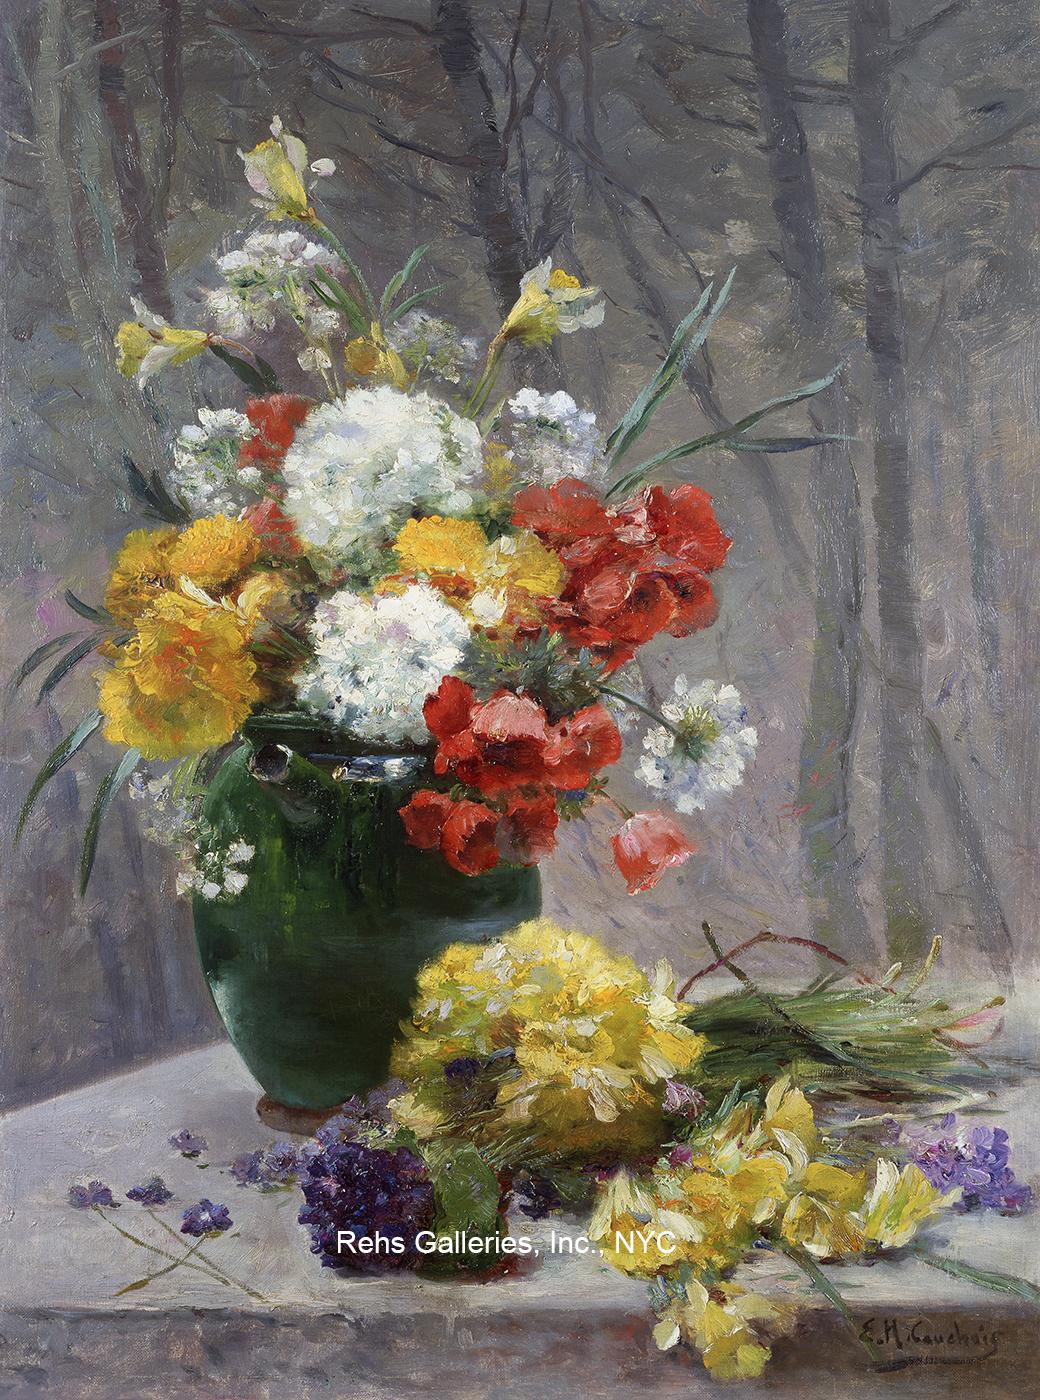 eugene_henri_cauchois_a3107_a_still_life_of_flowers_wm.jpg